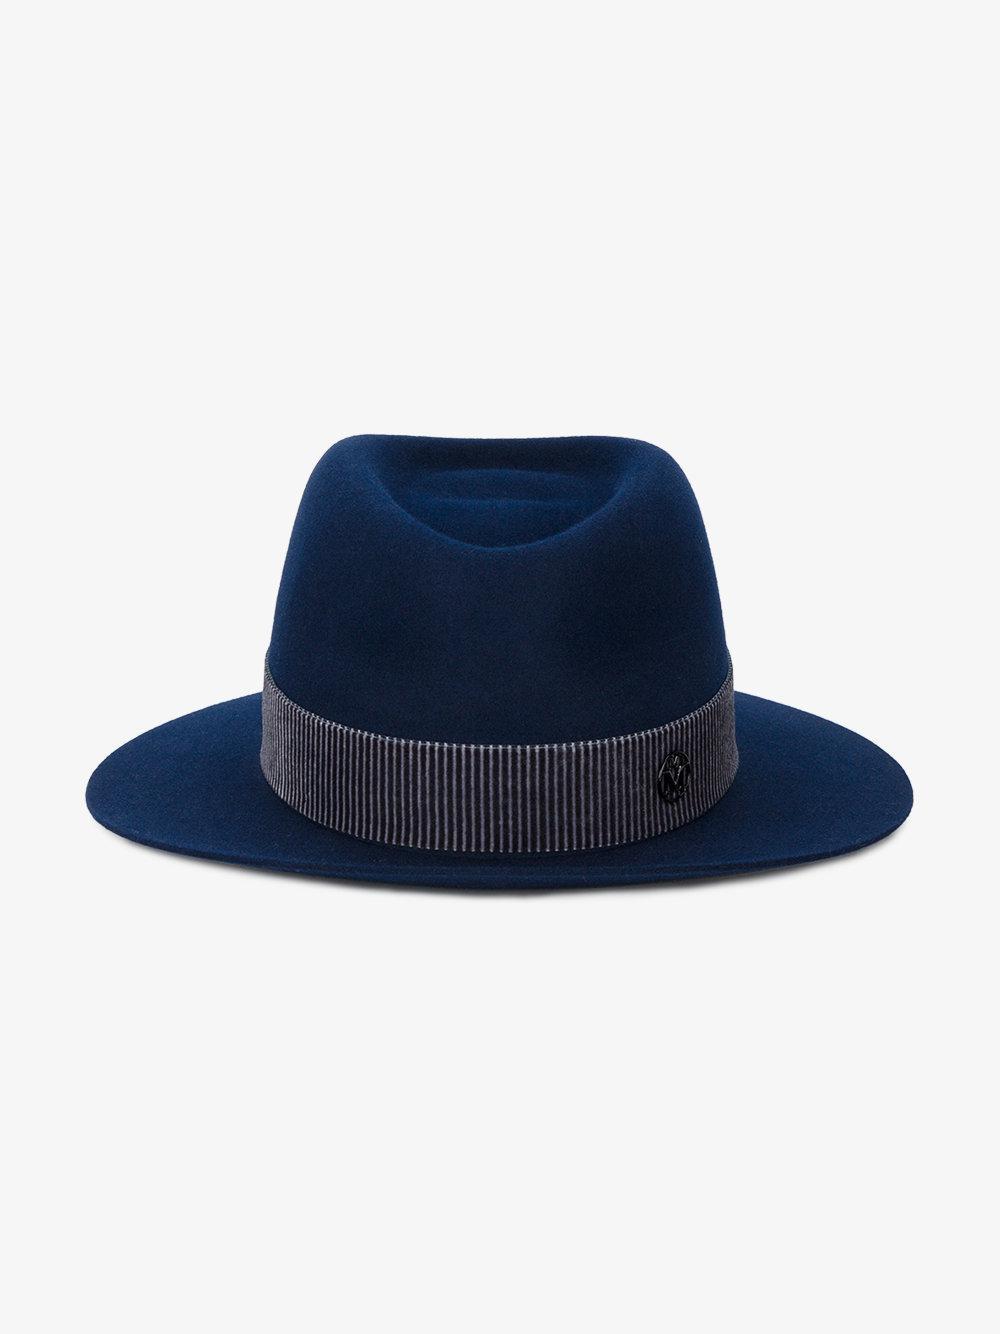 453371ec9ee Maison Michel André Trilby Hat in Blue for Men - Lyst